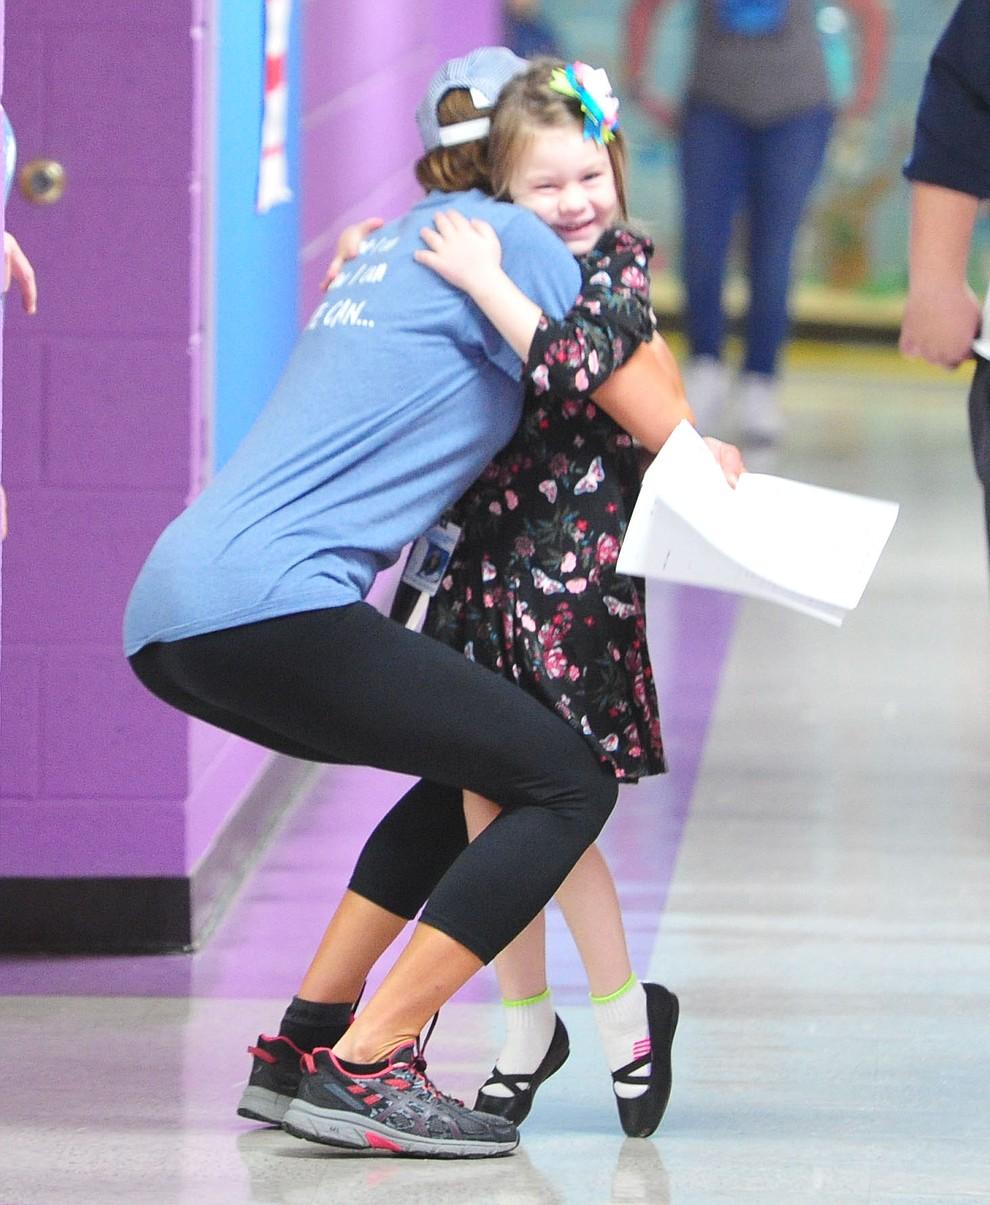 First grader Olivia Langston greets kindergarten teacher Rachel Leuschner as students in the Humboldt Unified School District returned to school at Coyote Springs Elementary School Monday, August 5, 2019, in Prescott Valley.  (Les Stukenberg/Courier)